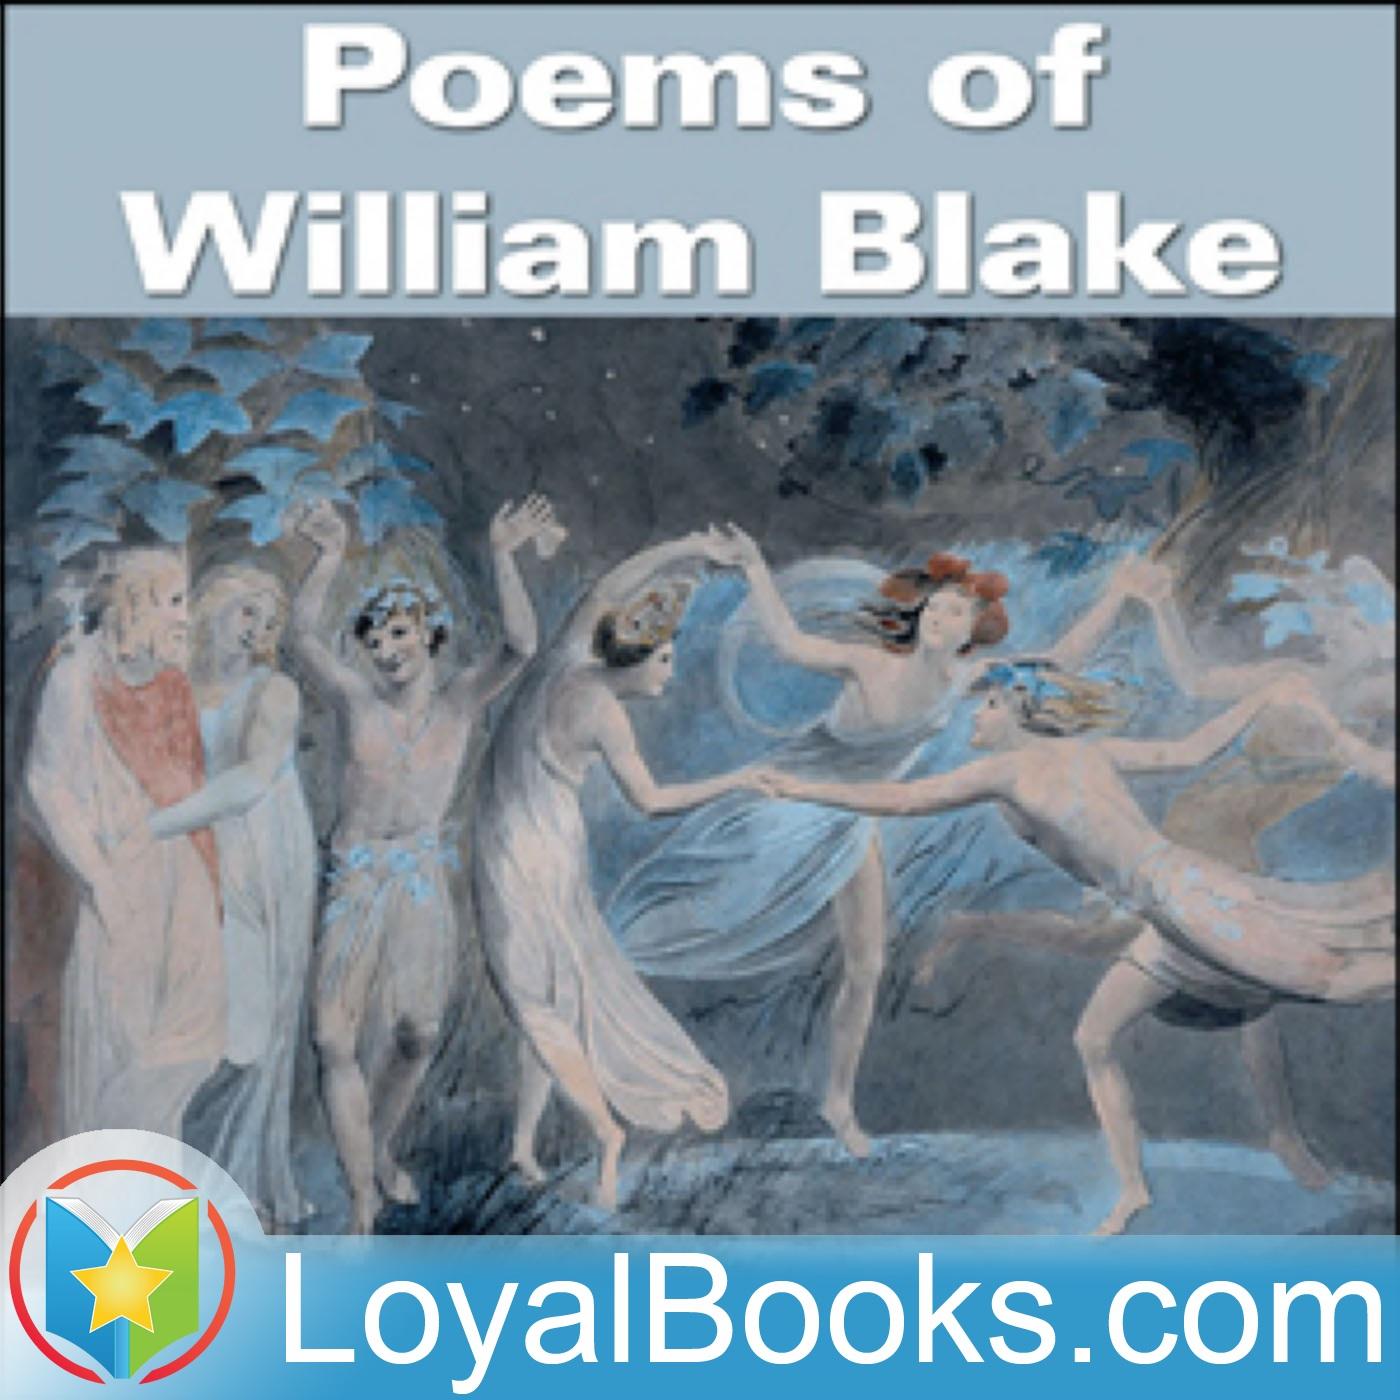 <![CDATA[Poems of William Blake by William Blake]]>